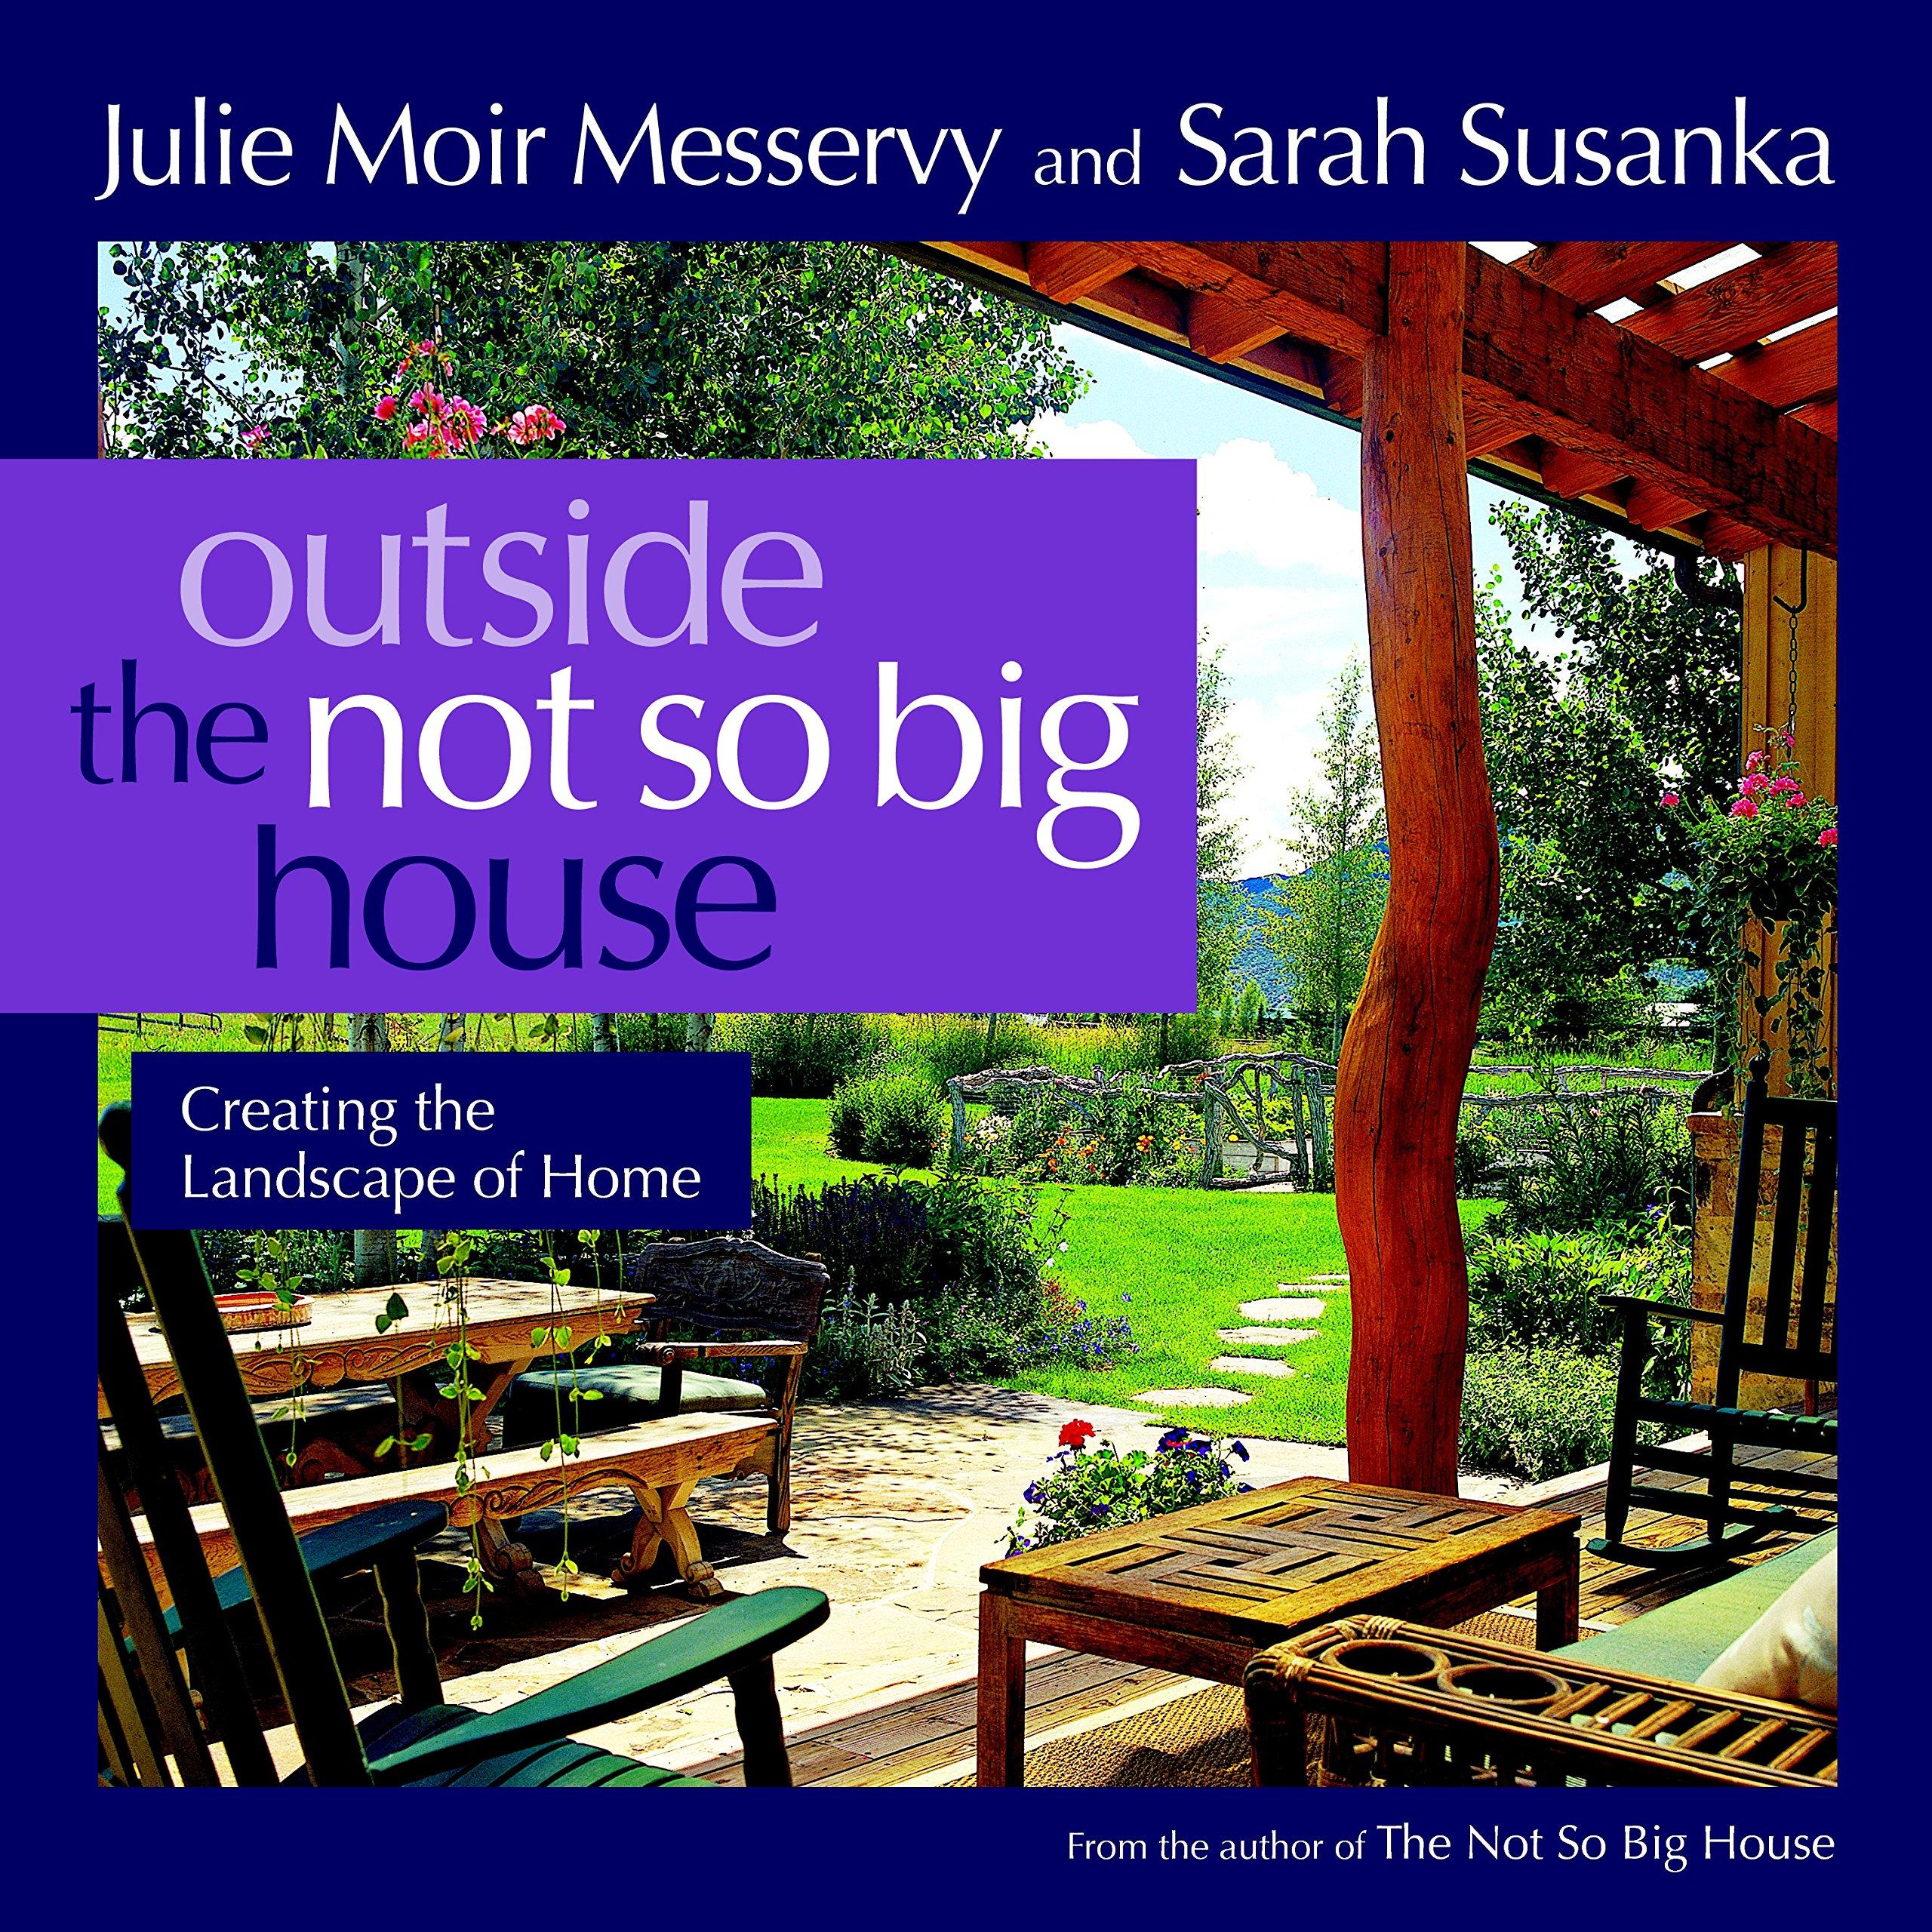 Outside Not Big House Landscape product image